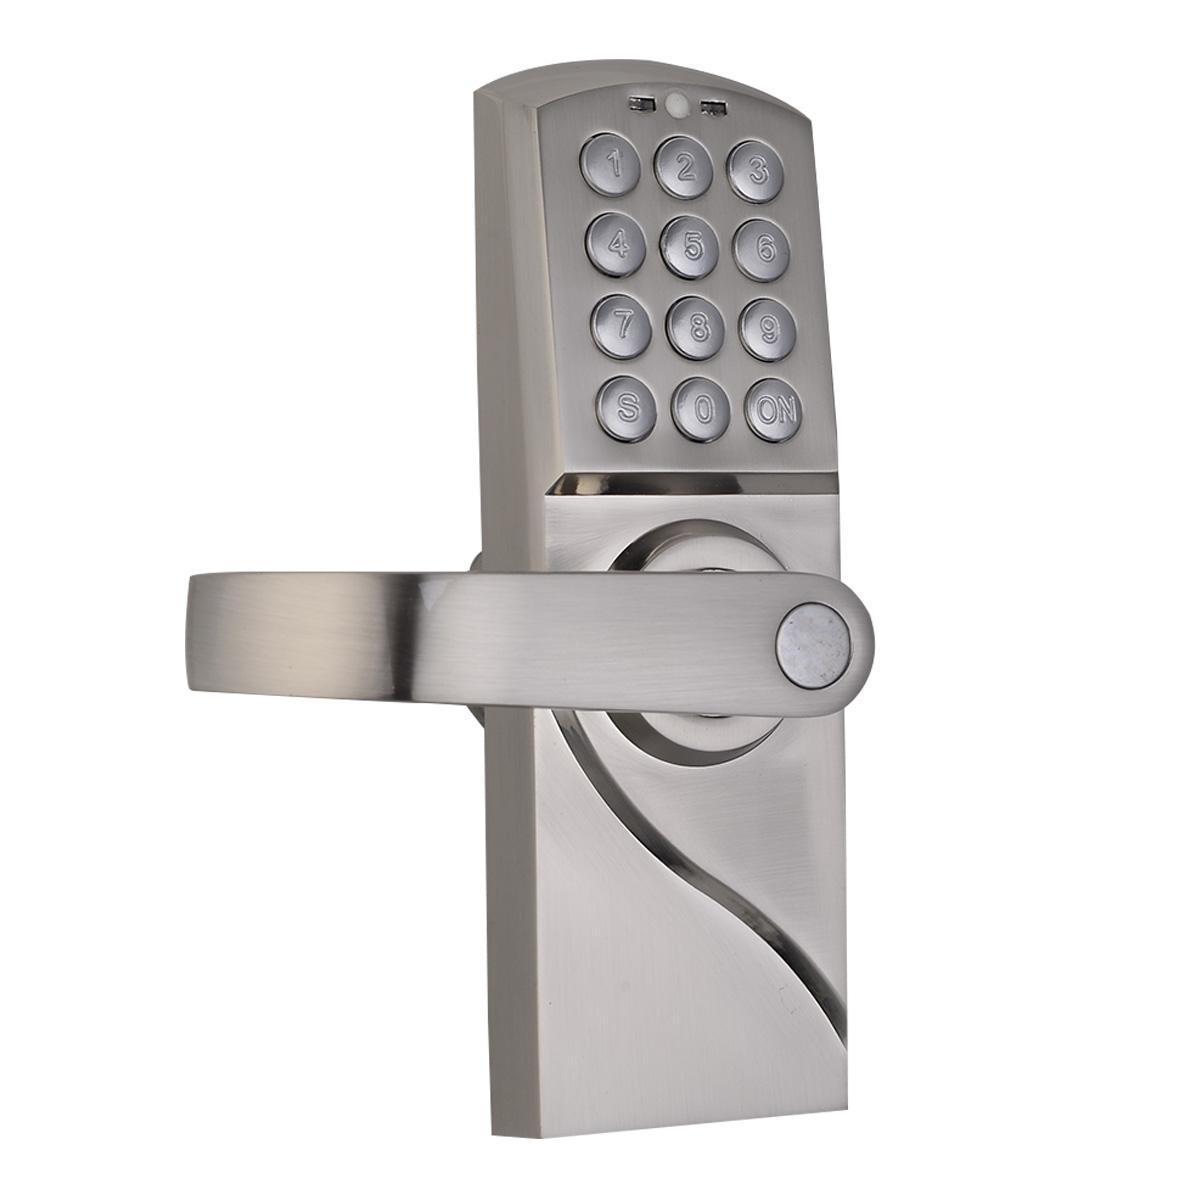 door knob with lock and key photo - 10